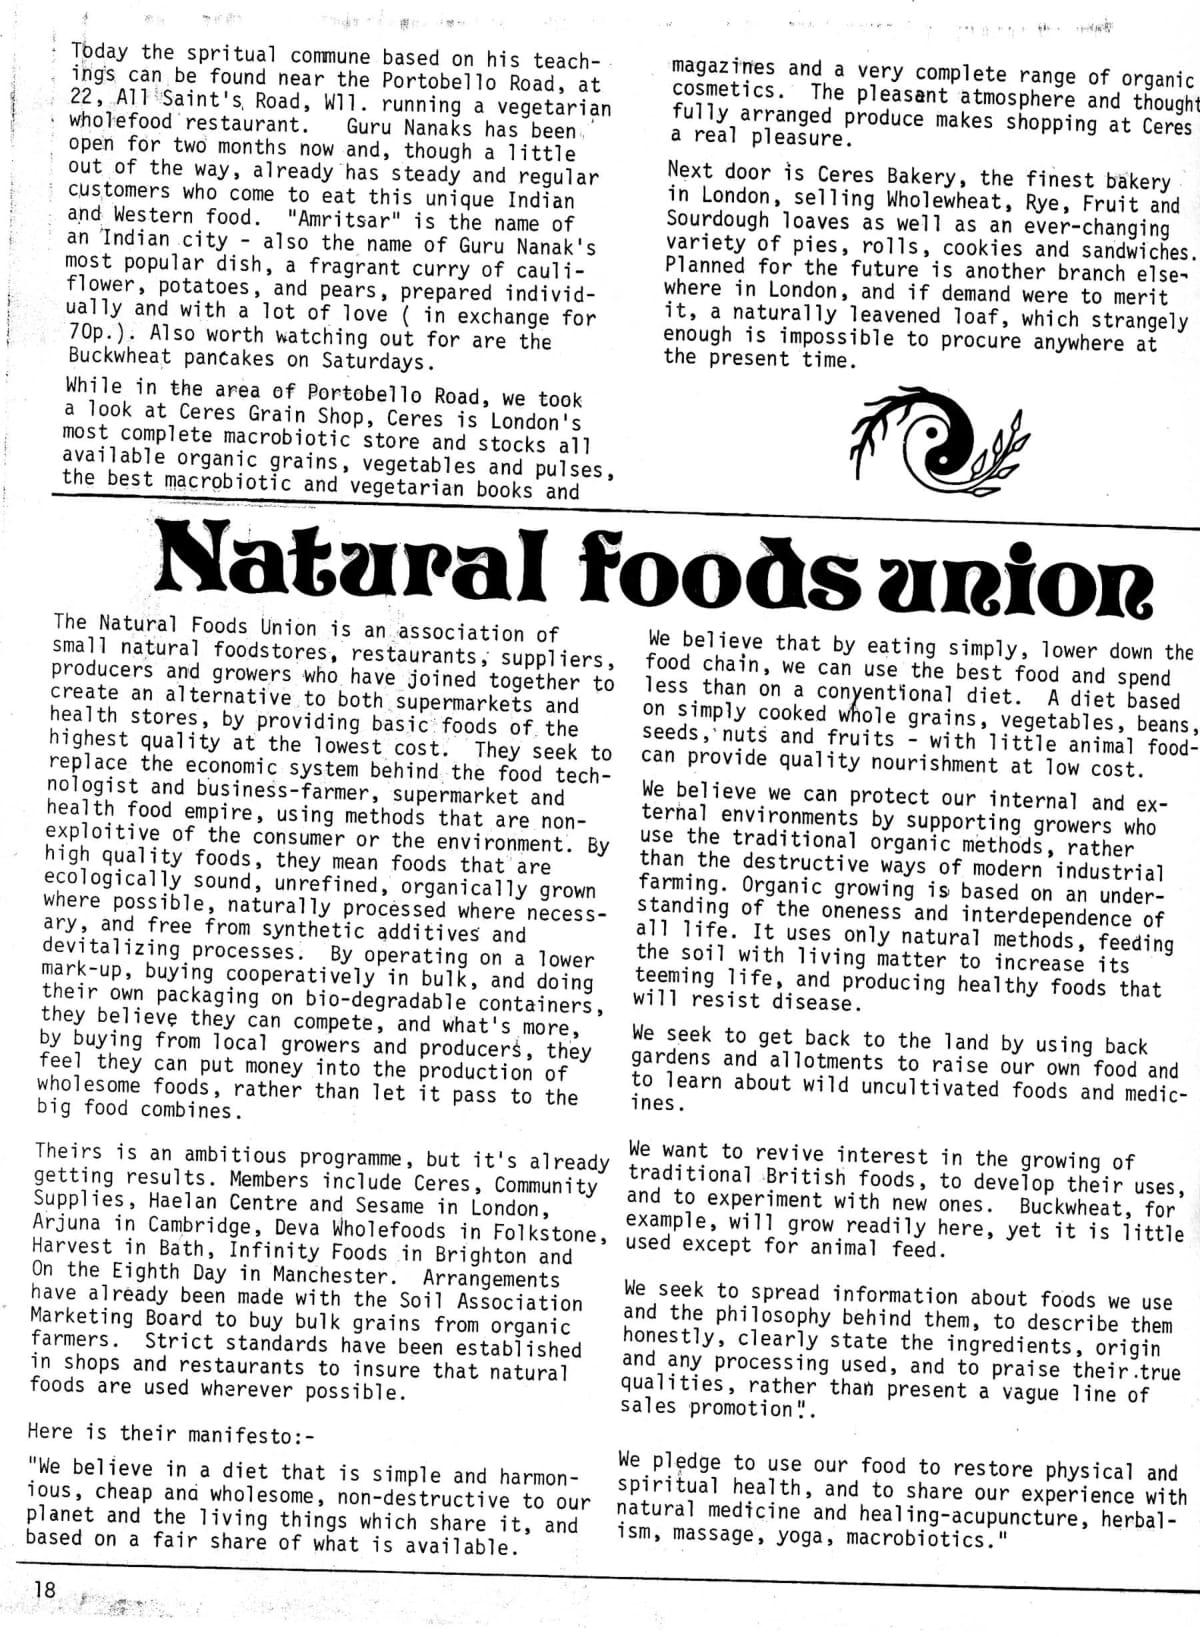 seed-v2-n5-may1973-18.jpg